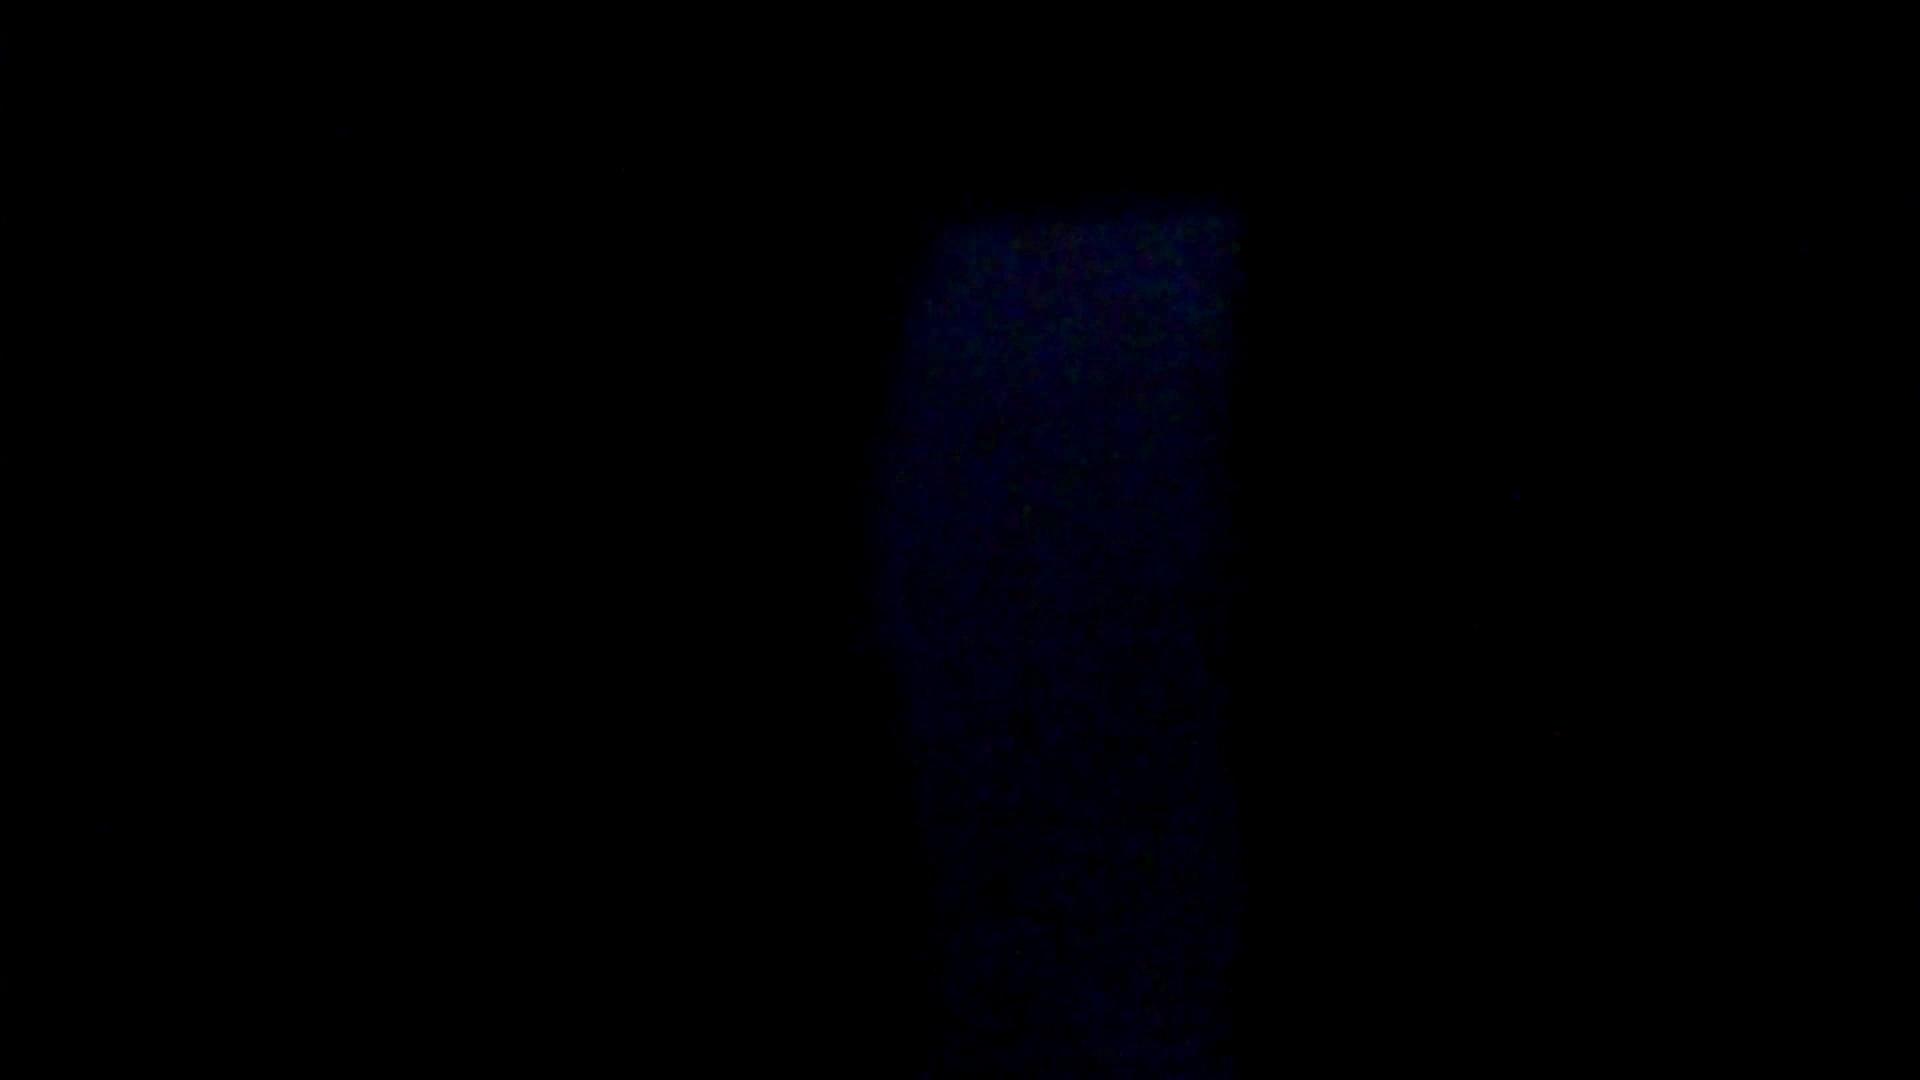 SPYさん初投稿!マンション覗き!5000K!ハイビジョン撮影VOL.04(現役ラグビー部大学生編) 男子学生 ゲイセックス画像 74枚 34